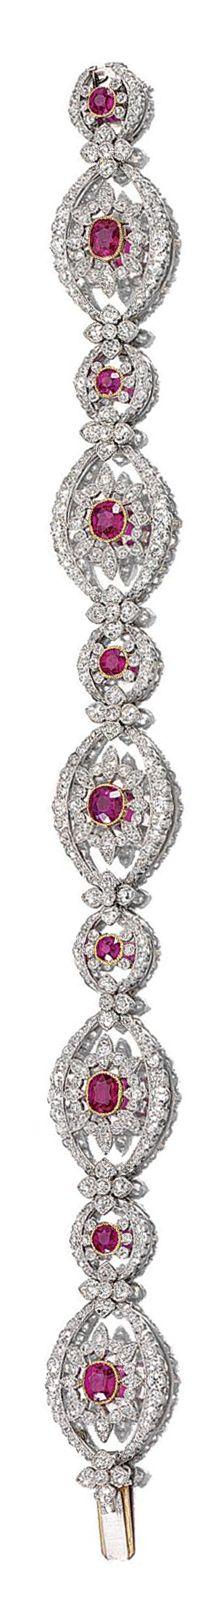 RUBY AND DIAMOND BRACELET/COLLIER DE CHIEN, CIRCA 1910